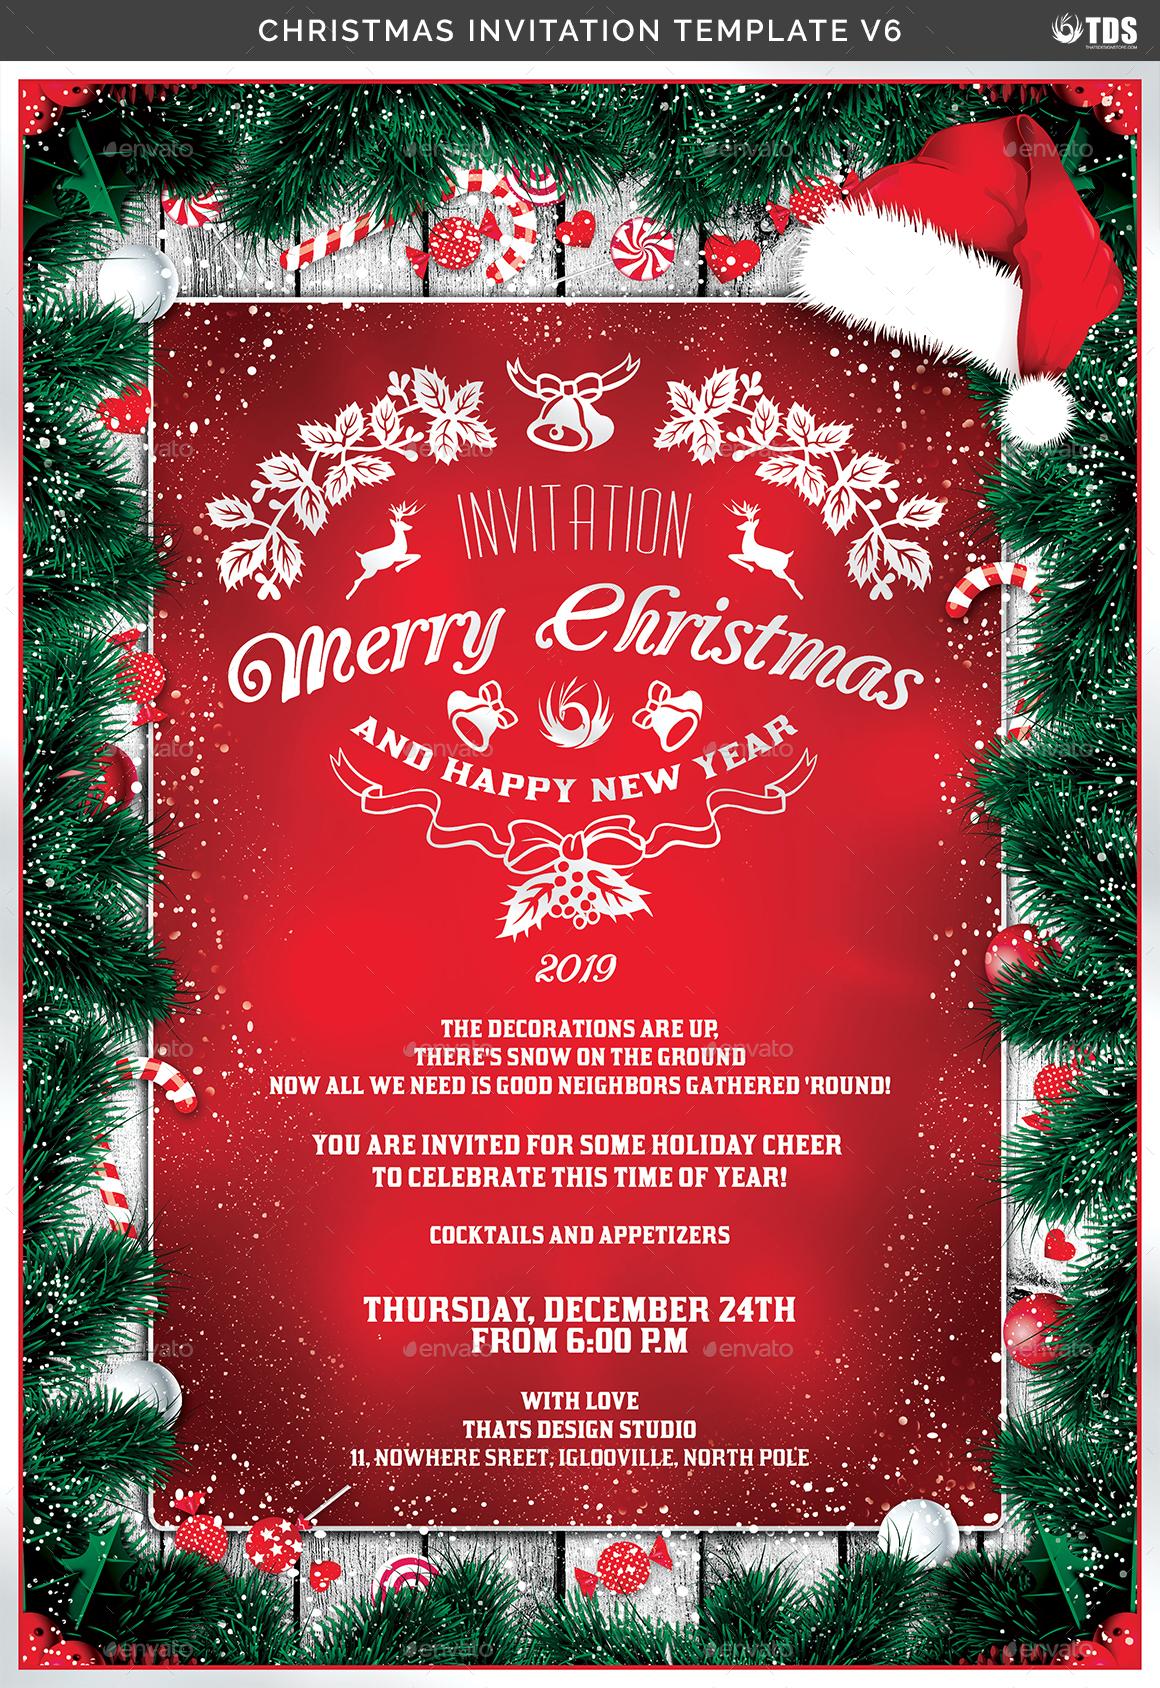 Christmas Invitation.Christmas Invitation Template V6